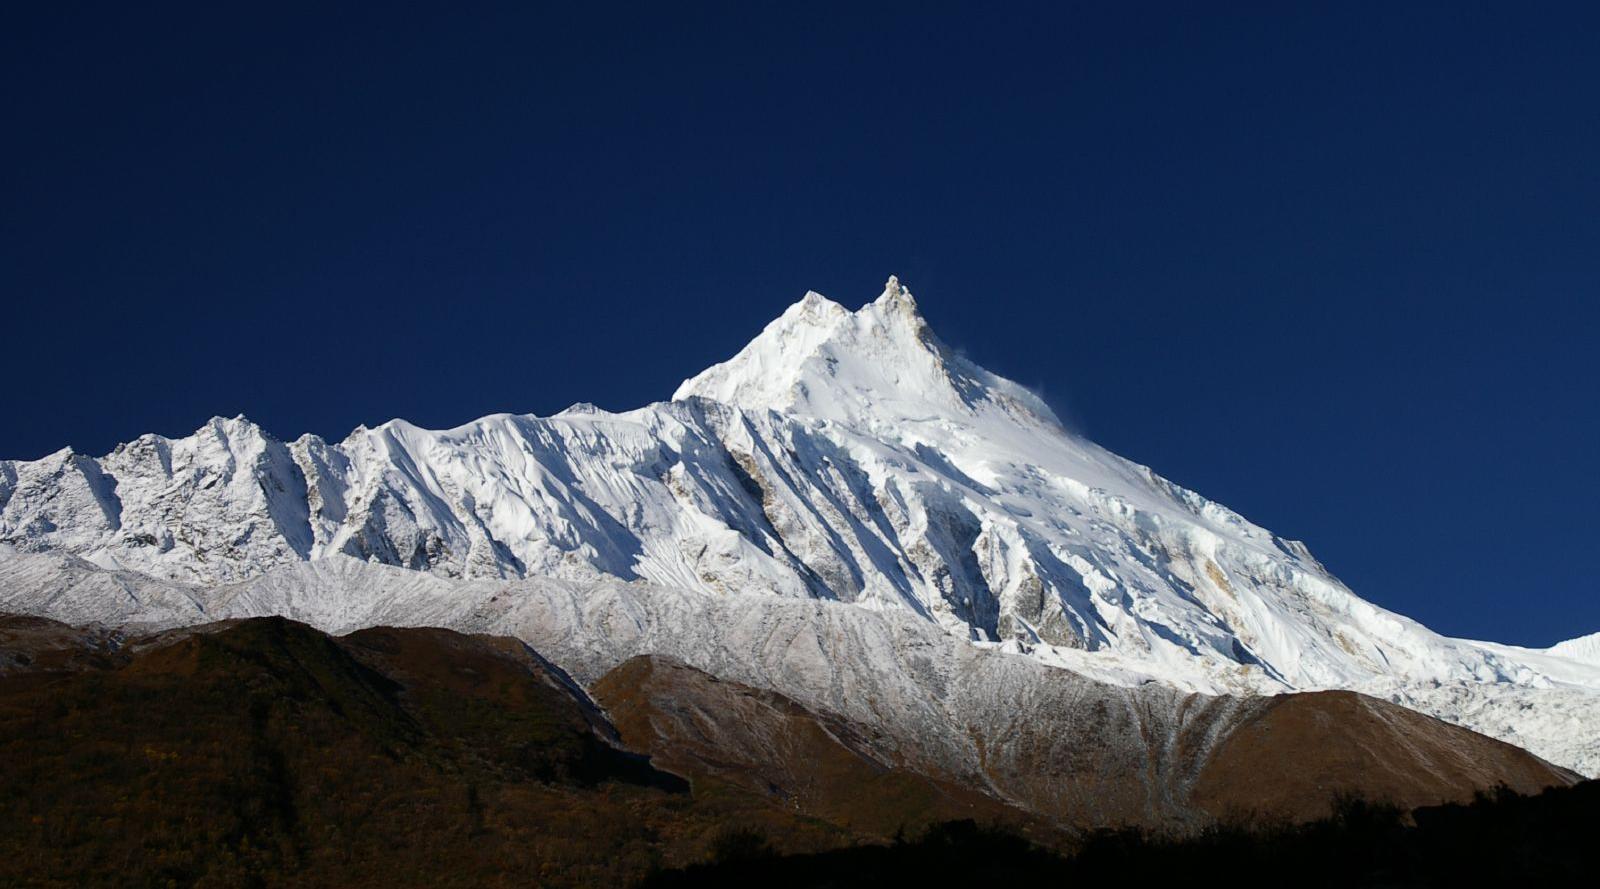 Puncak Gunung Manaslu - 8.156 mdpl (Nepal) puncak tertinggi di dunia adalah gunung ranking gunung tertinggi di dunia sebutkan 3 gunung tertinggi didunia sebutkan 5 gunung tertinggi di dunia